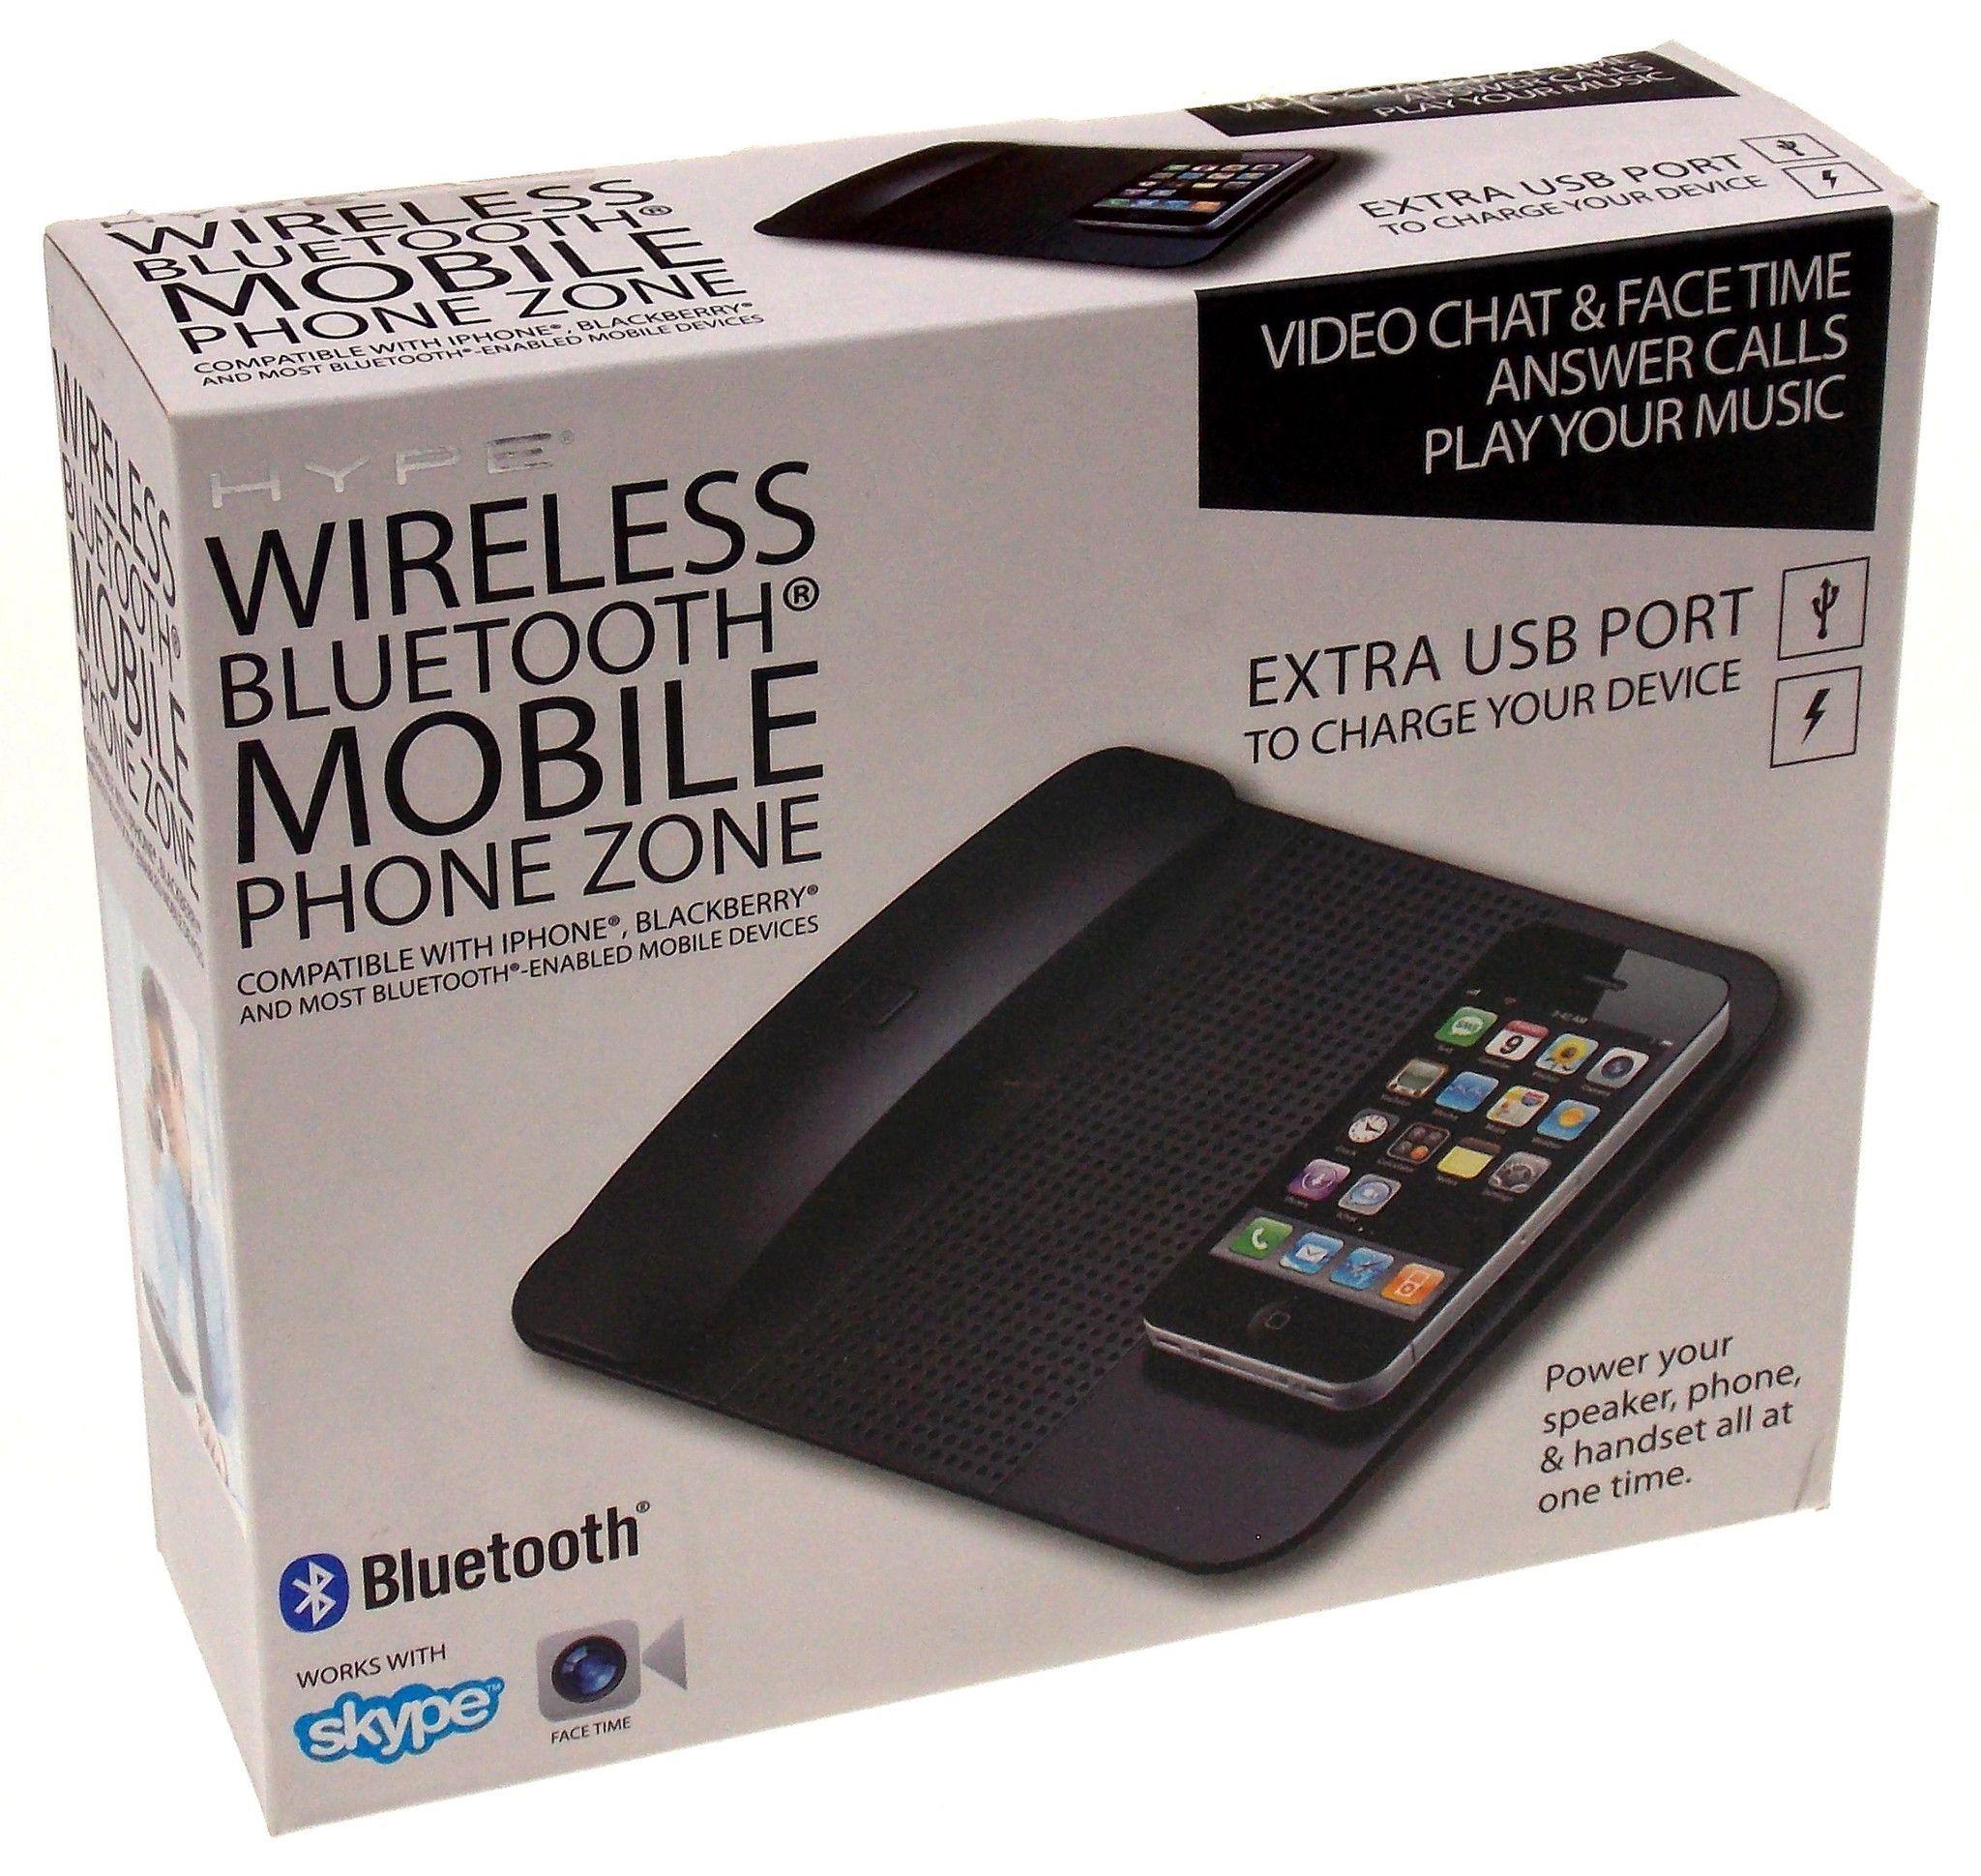 Hype Wireless Bluetooth Mobile Phone Zone Speaker Handset